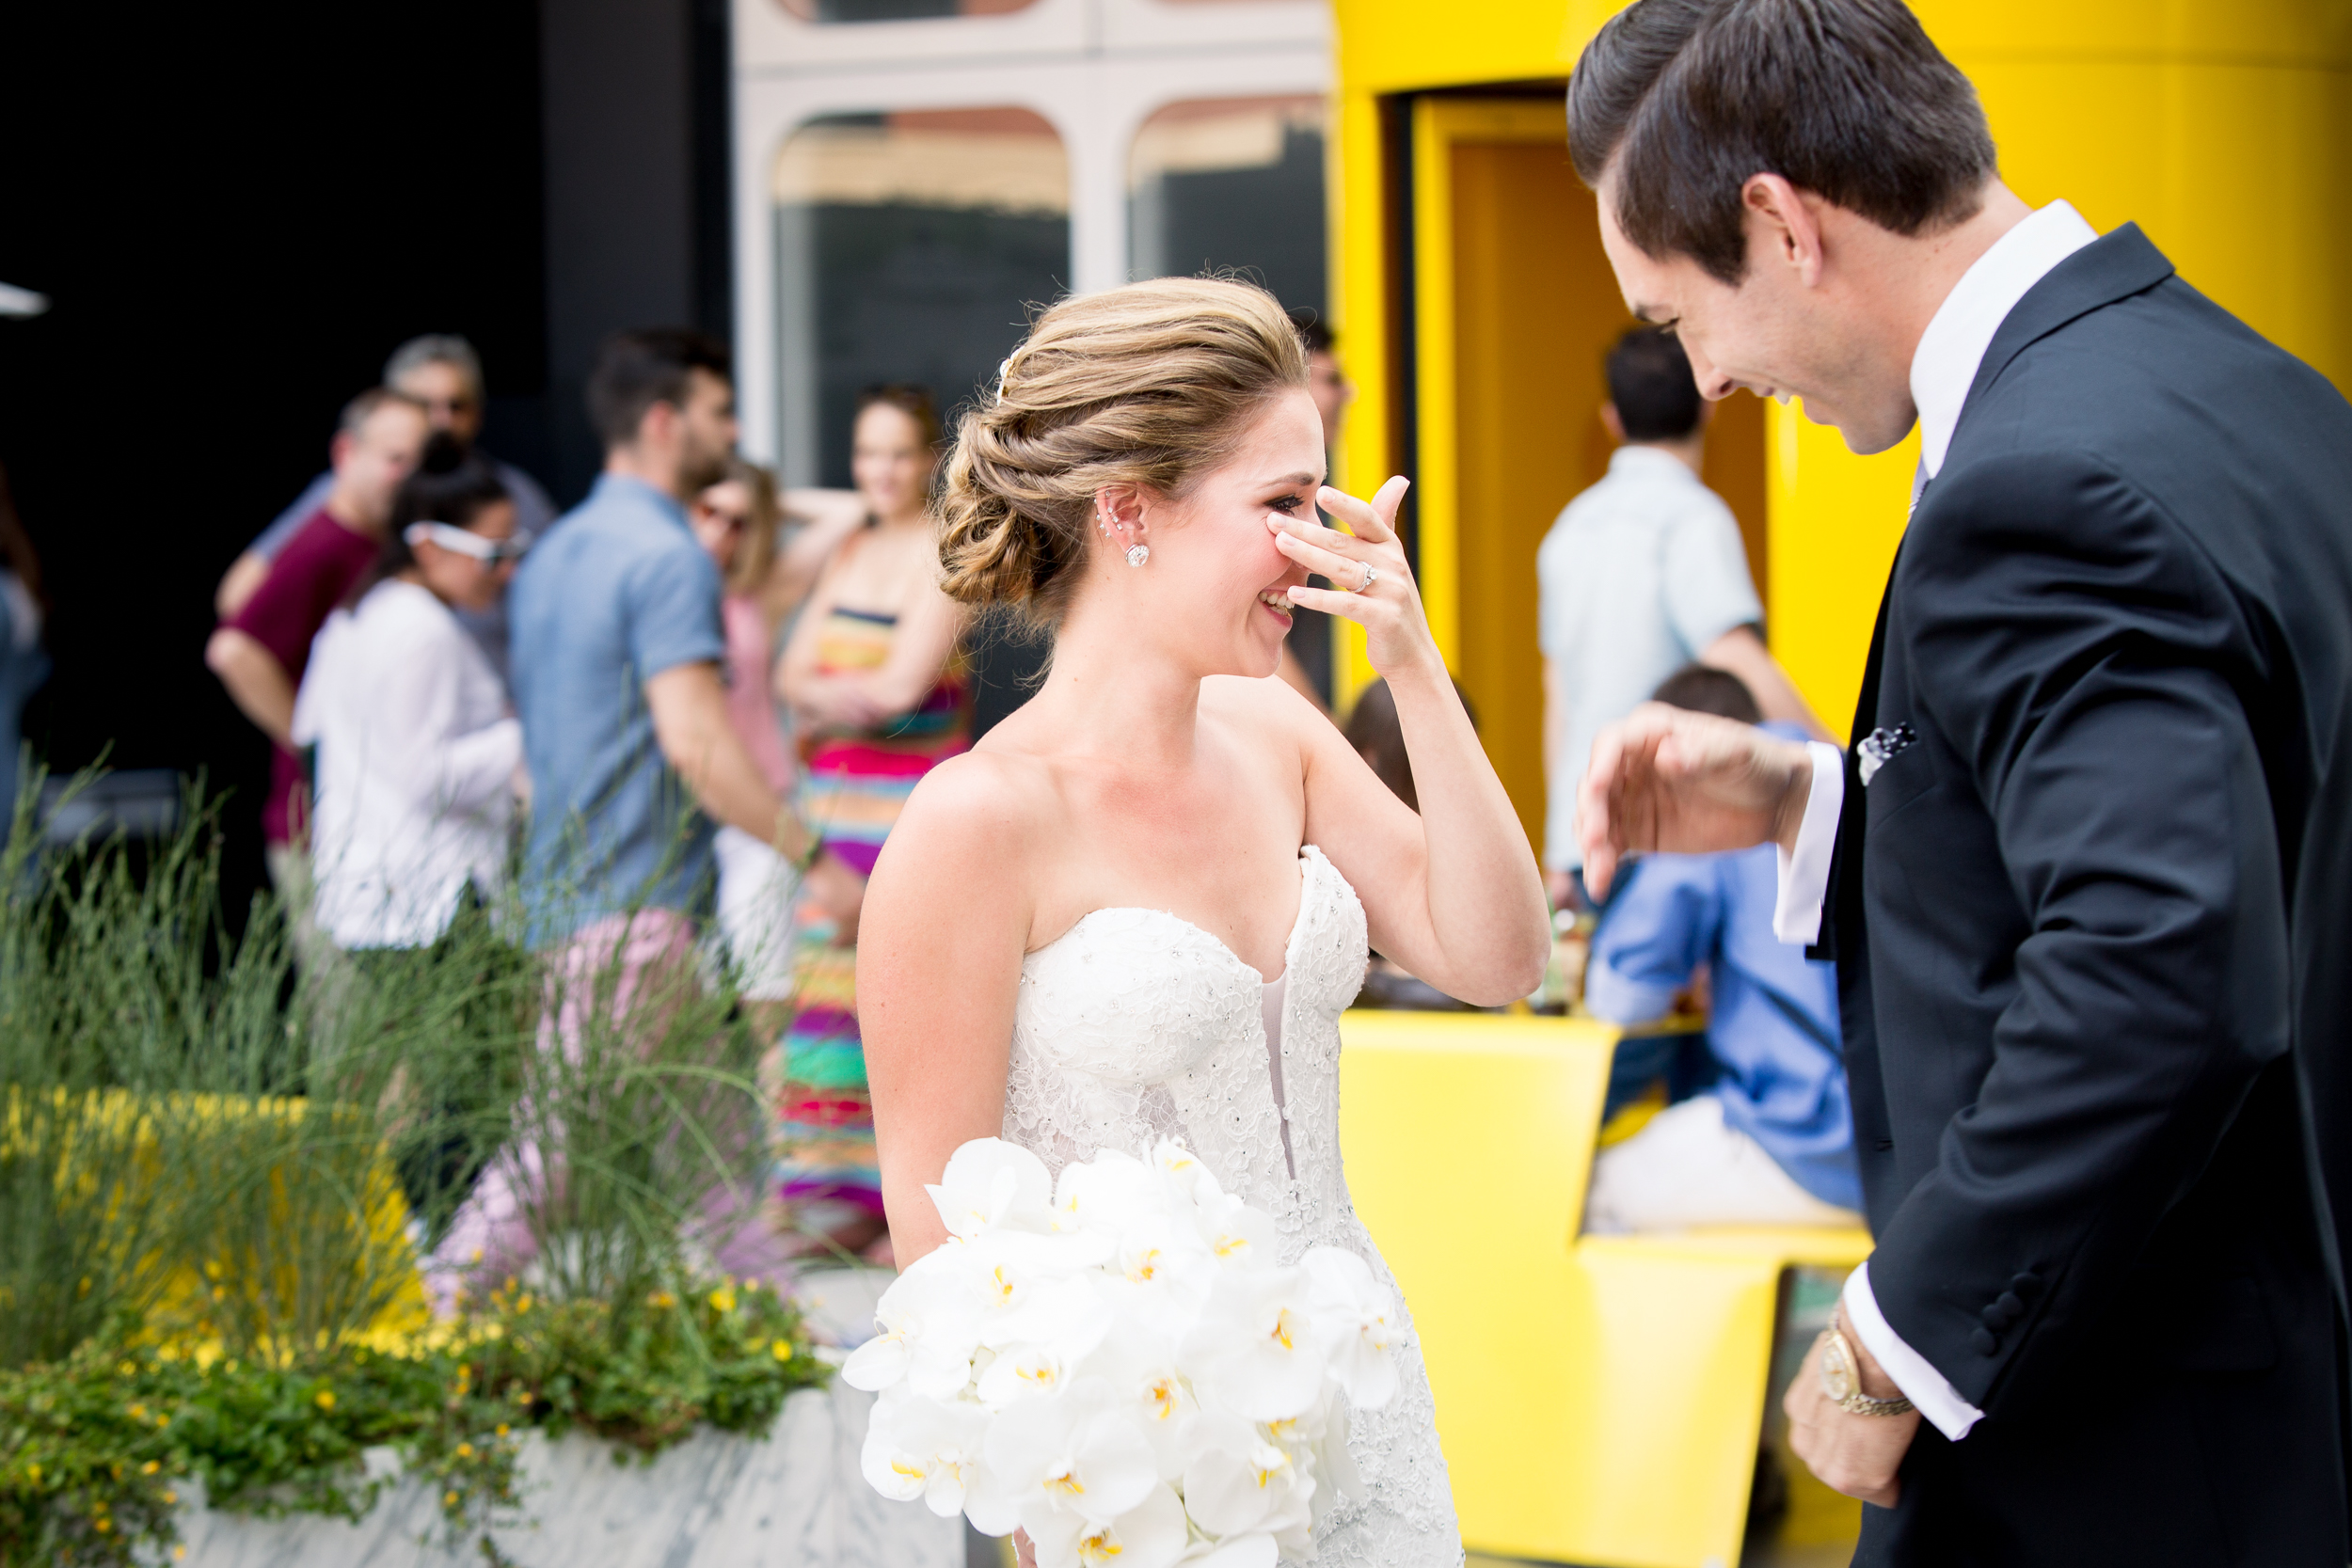 Ceci_New_York_Style_Luxury_Custom_Summer_Wedding_CeciBride_Letterpress_NewYork_Foil_Lighthouse_Chelsea_Piers_18.jpg